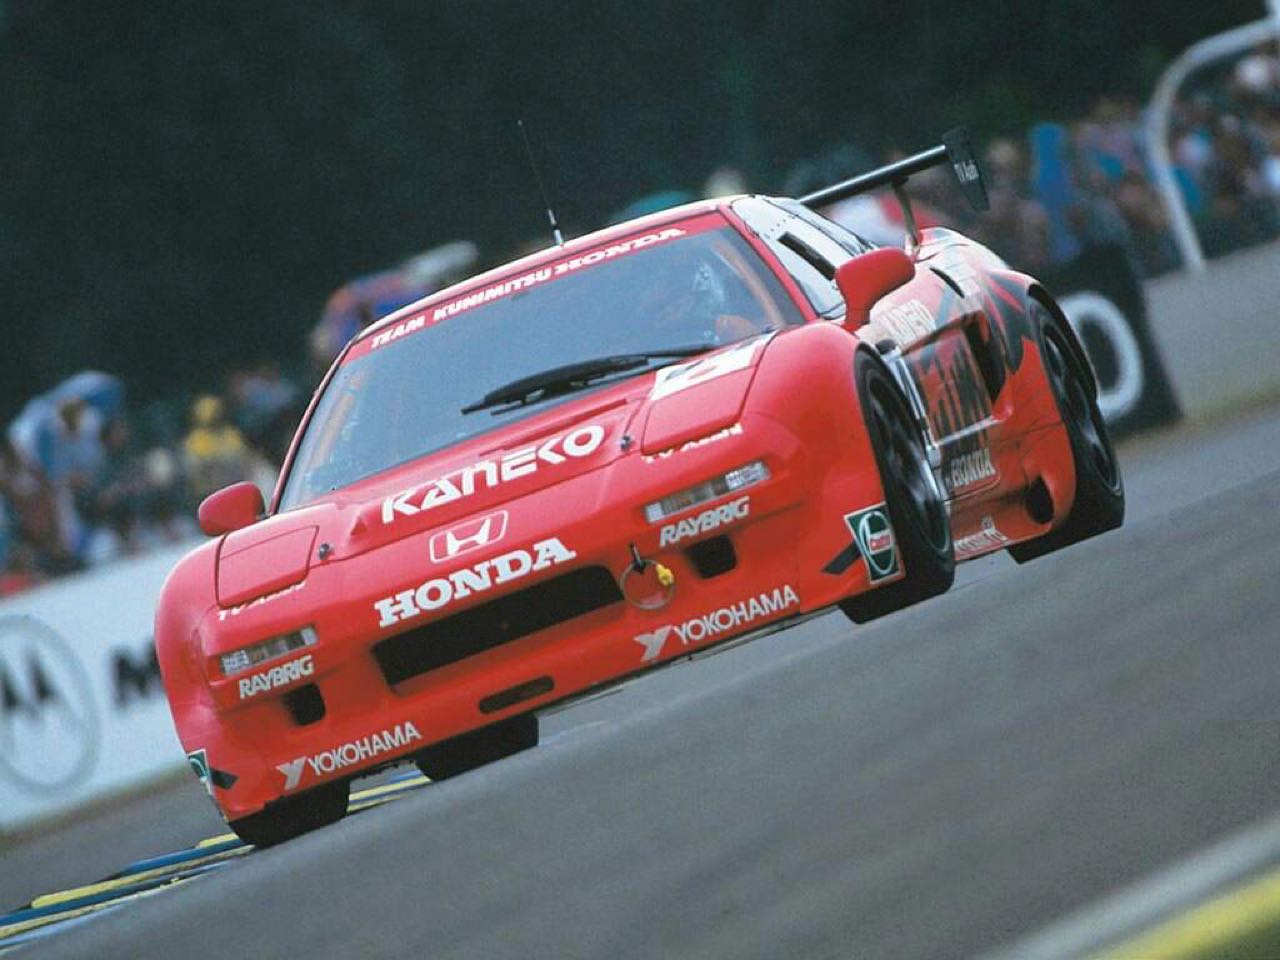 #Petrolhead - Keiichi Tsuchiya - Le Maître du drift ! 10